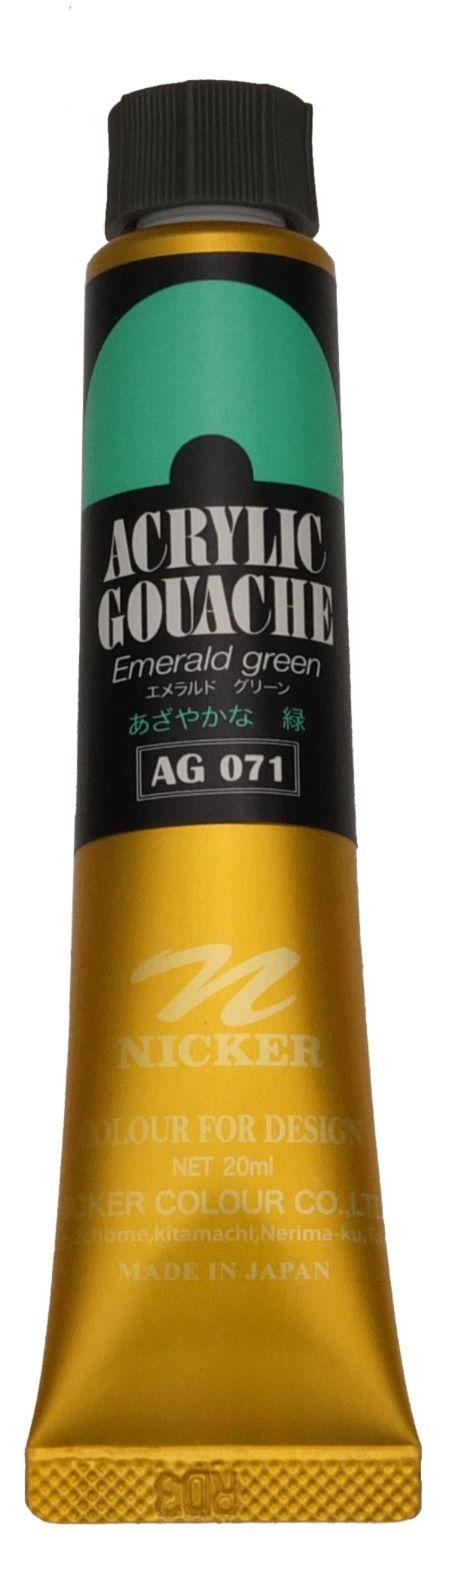 ACRYLIC GOUACHE 20ml AG071 EMERALD GREEN